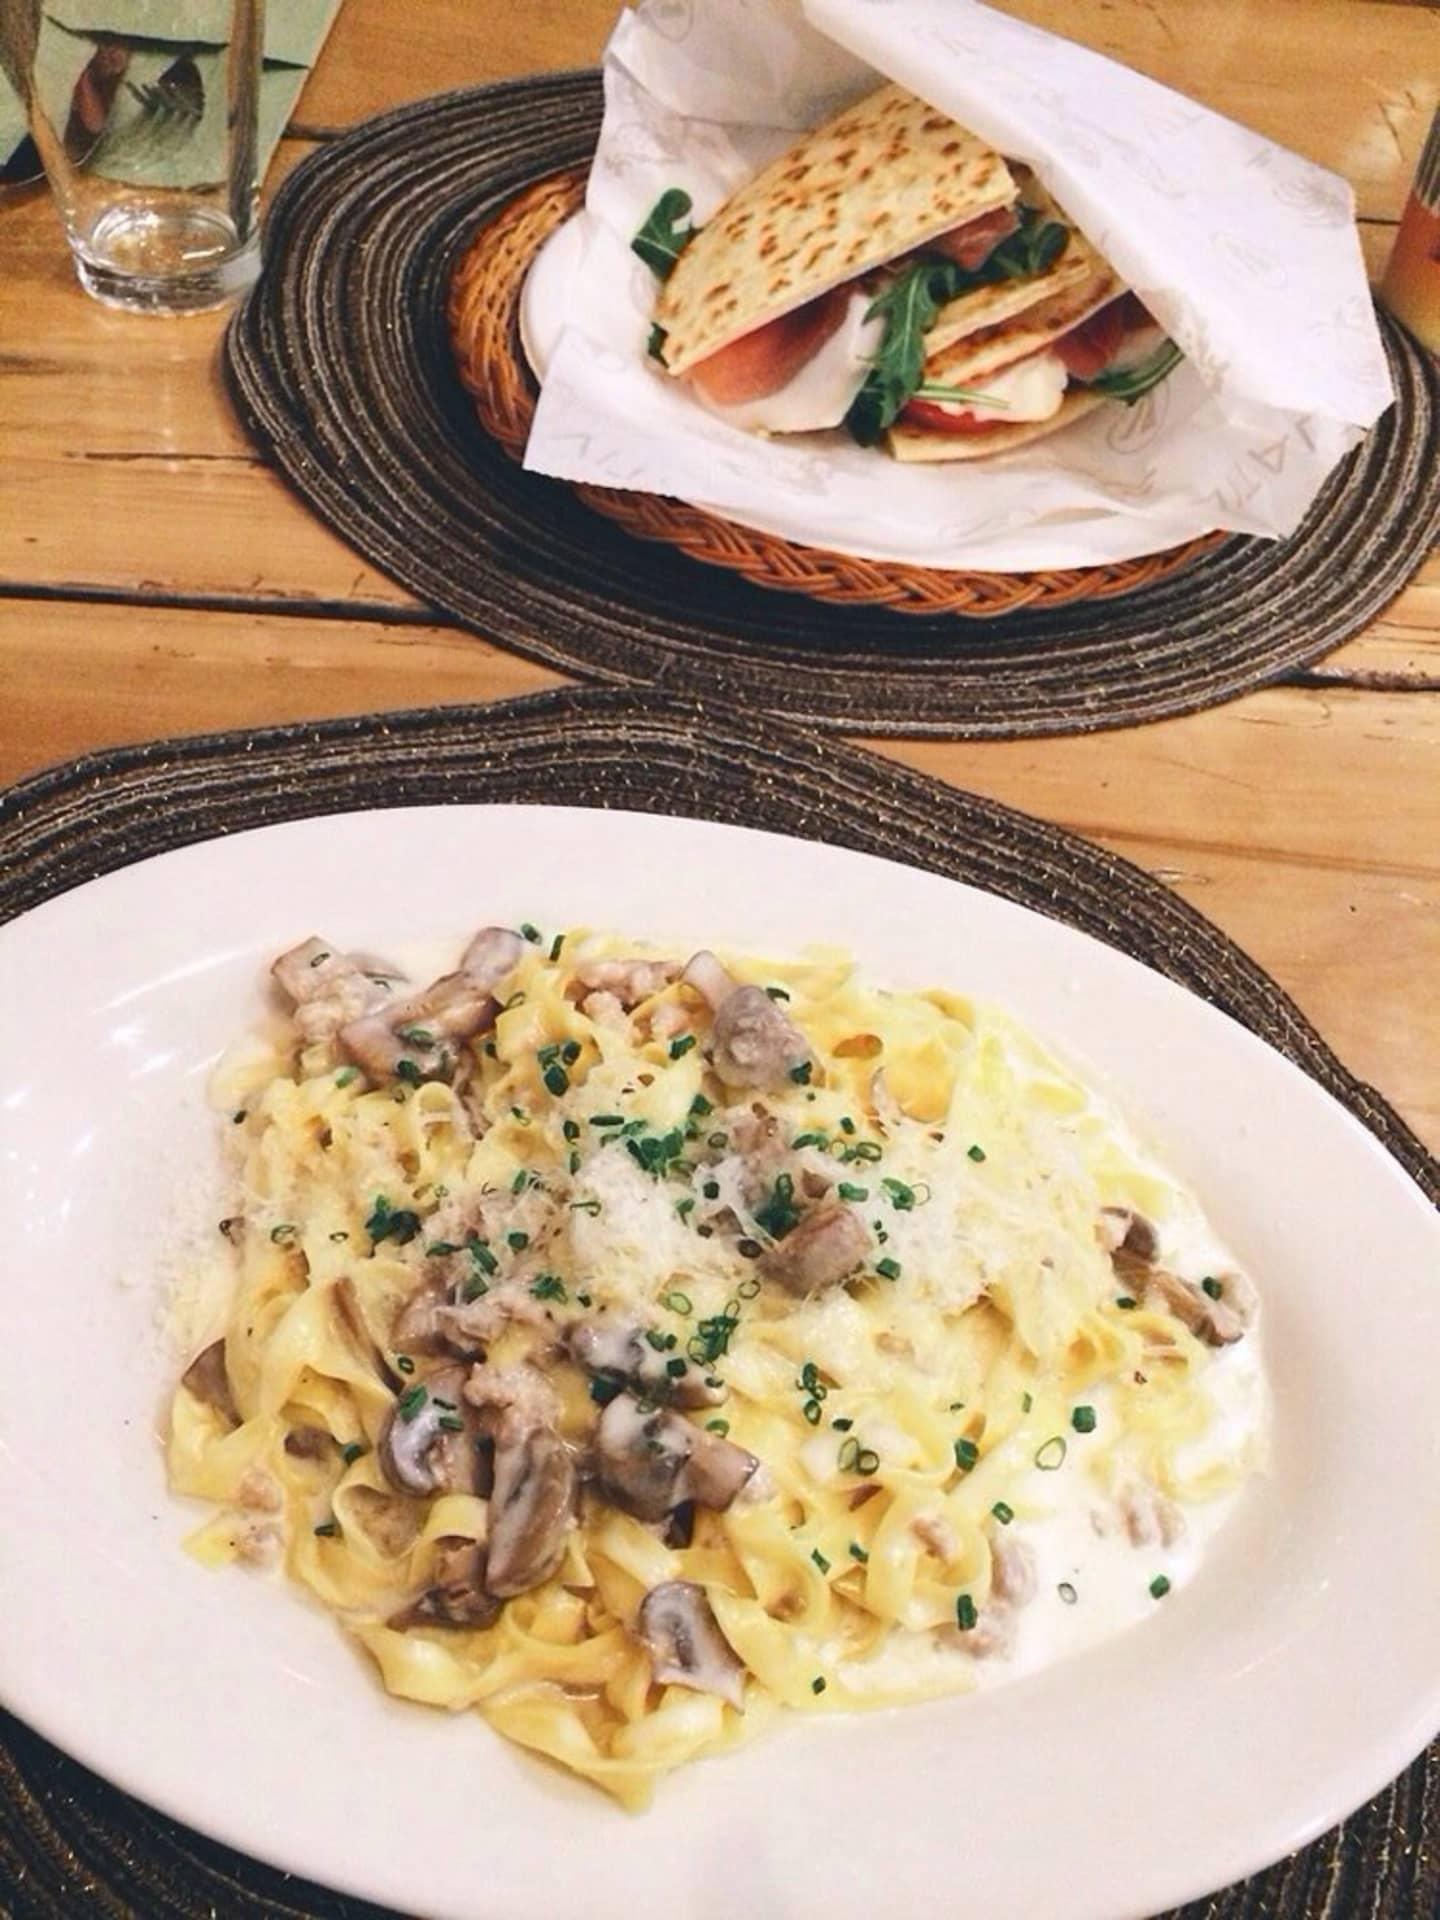 Sausage Mushrooms and cream